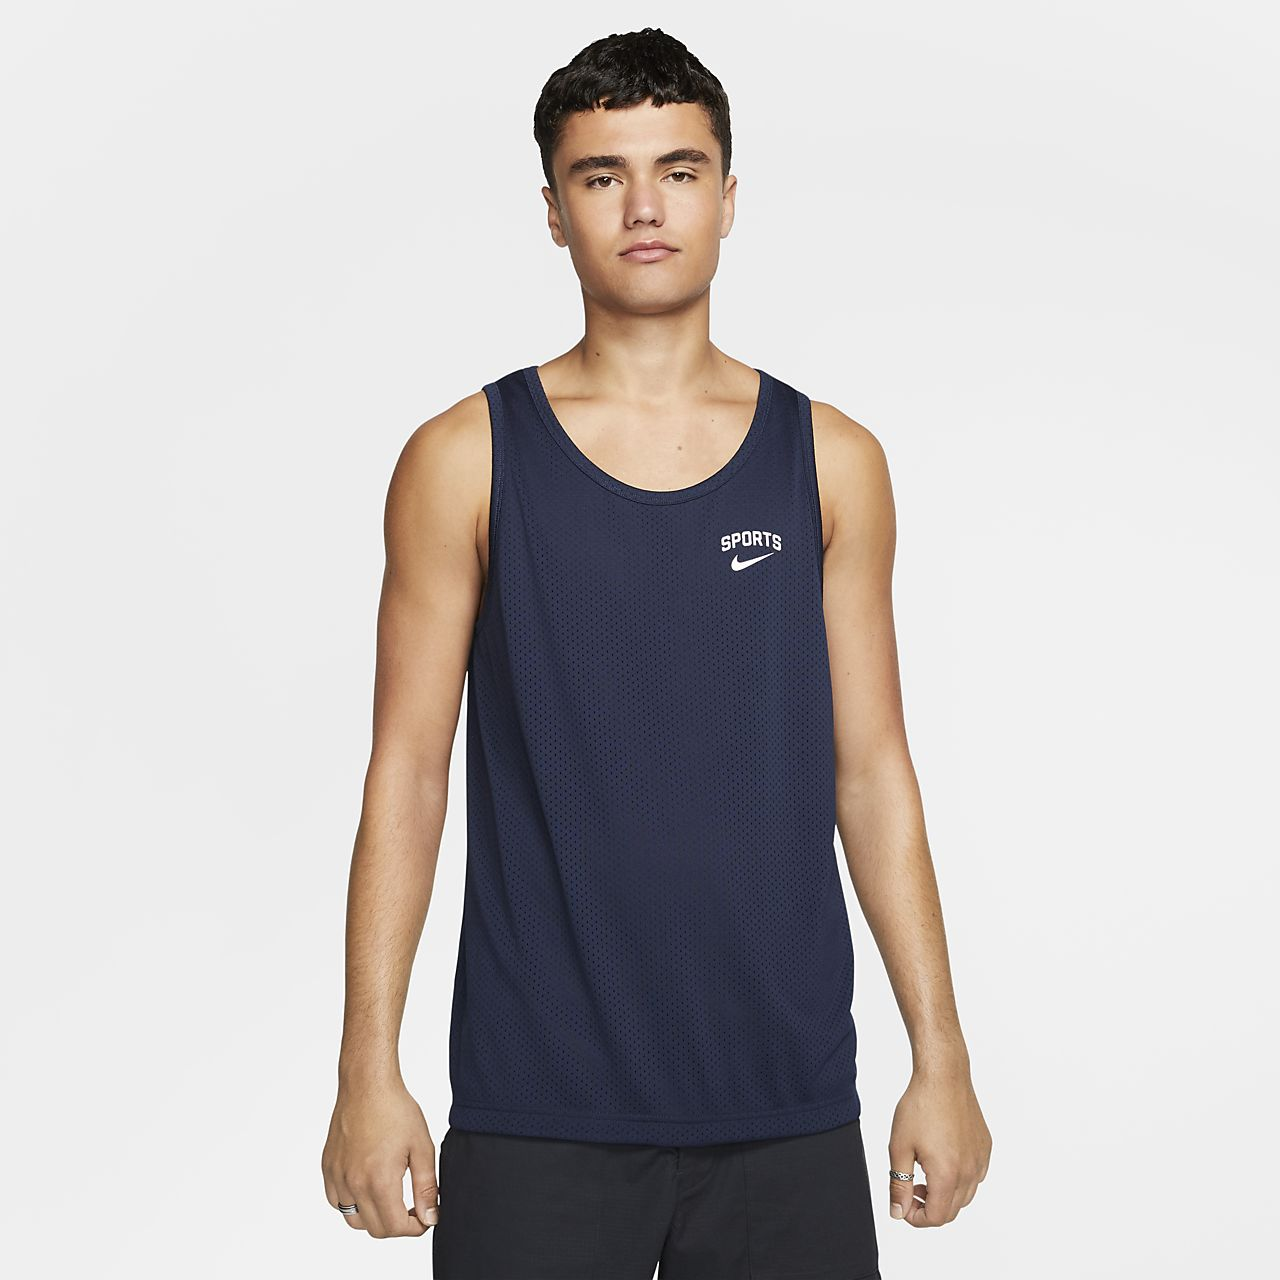 Nike Hombre Camiseta Con Para Sb Dri Tirantes Estampado Fit Skateboarding De 8PNOynvmw0